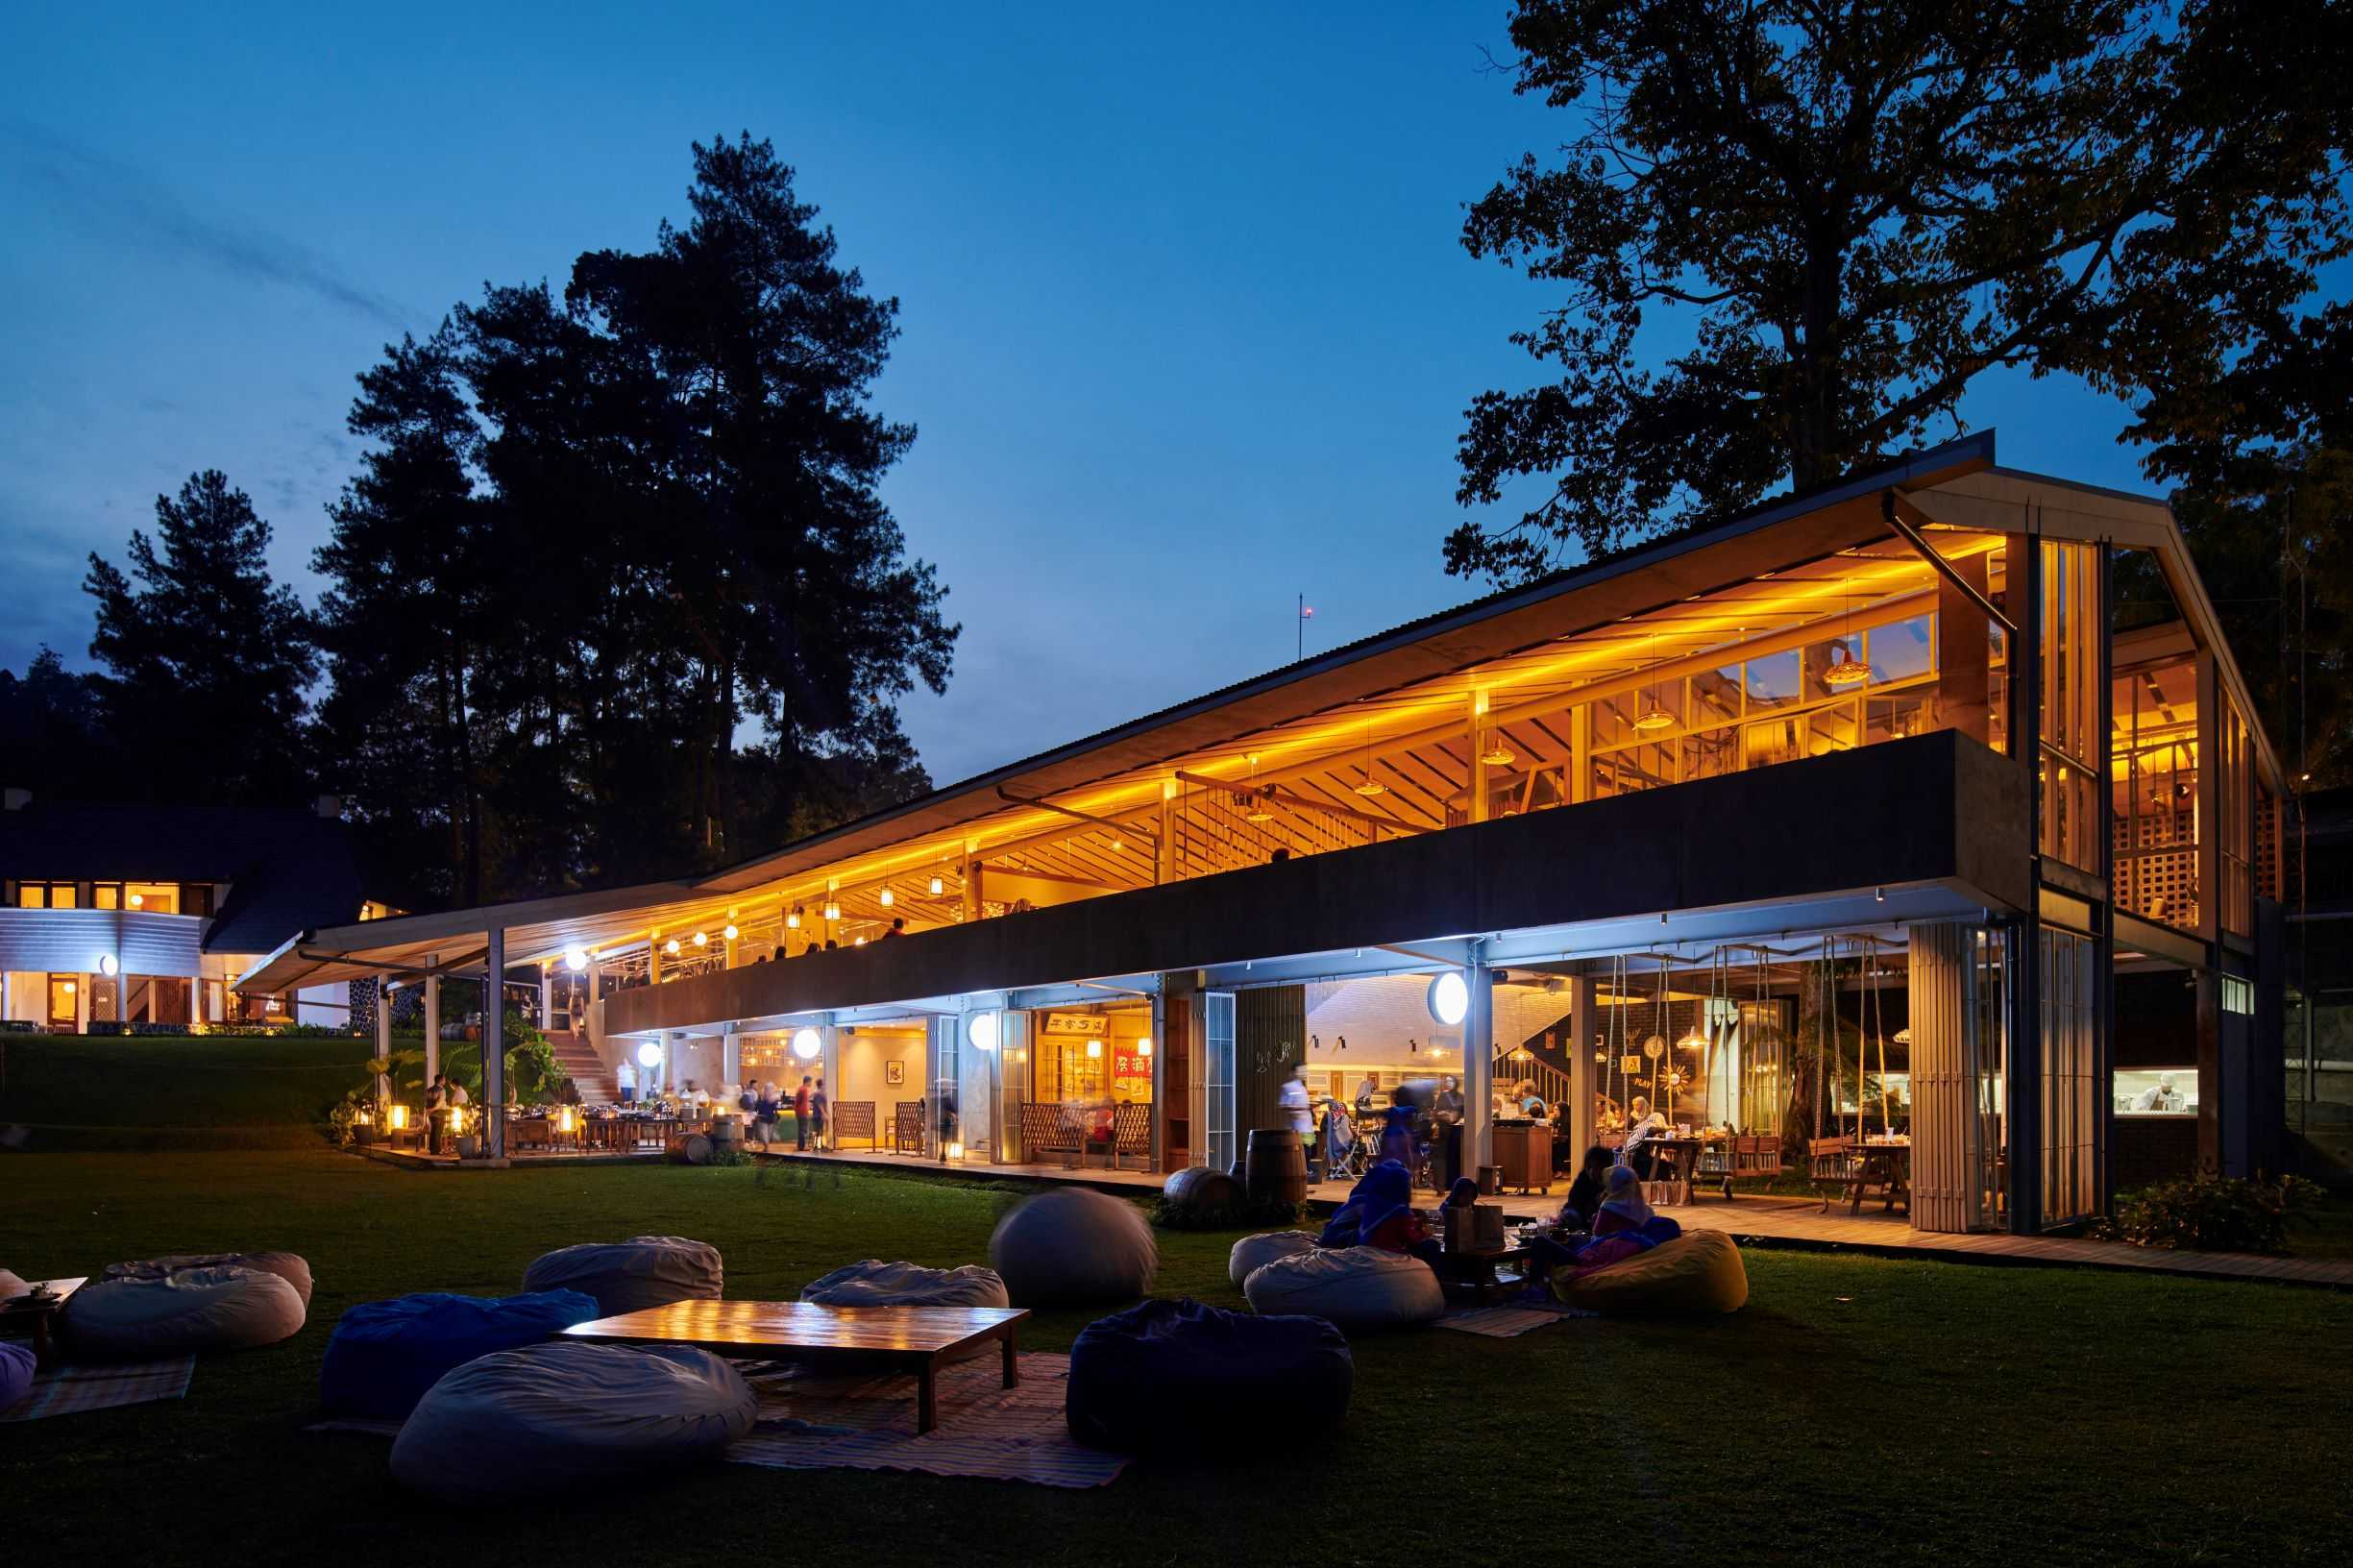 Hadivincent Architects Nara Park Ciumbuleuit, Cidadap, Kota Bandung, Jawa Barat, Indonesia Ciumbuleuit, Cidadap, Kota Bandung, Jawa Barat, Indonesia Hadivincent-Architects-Nara-Park   71543